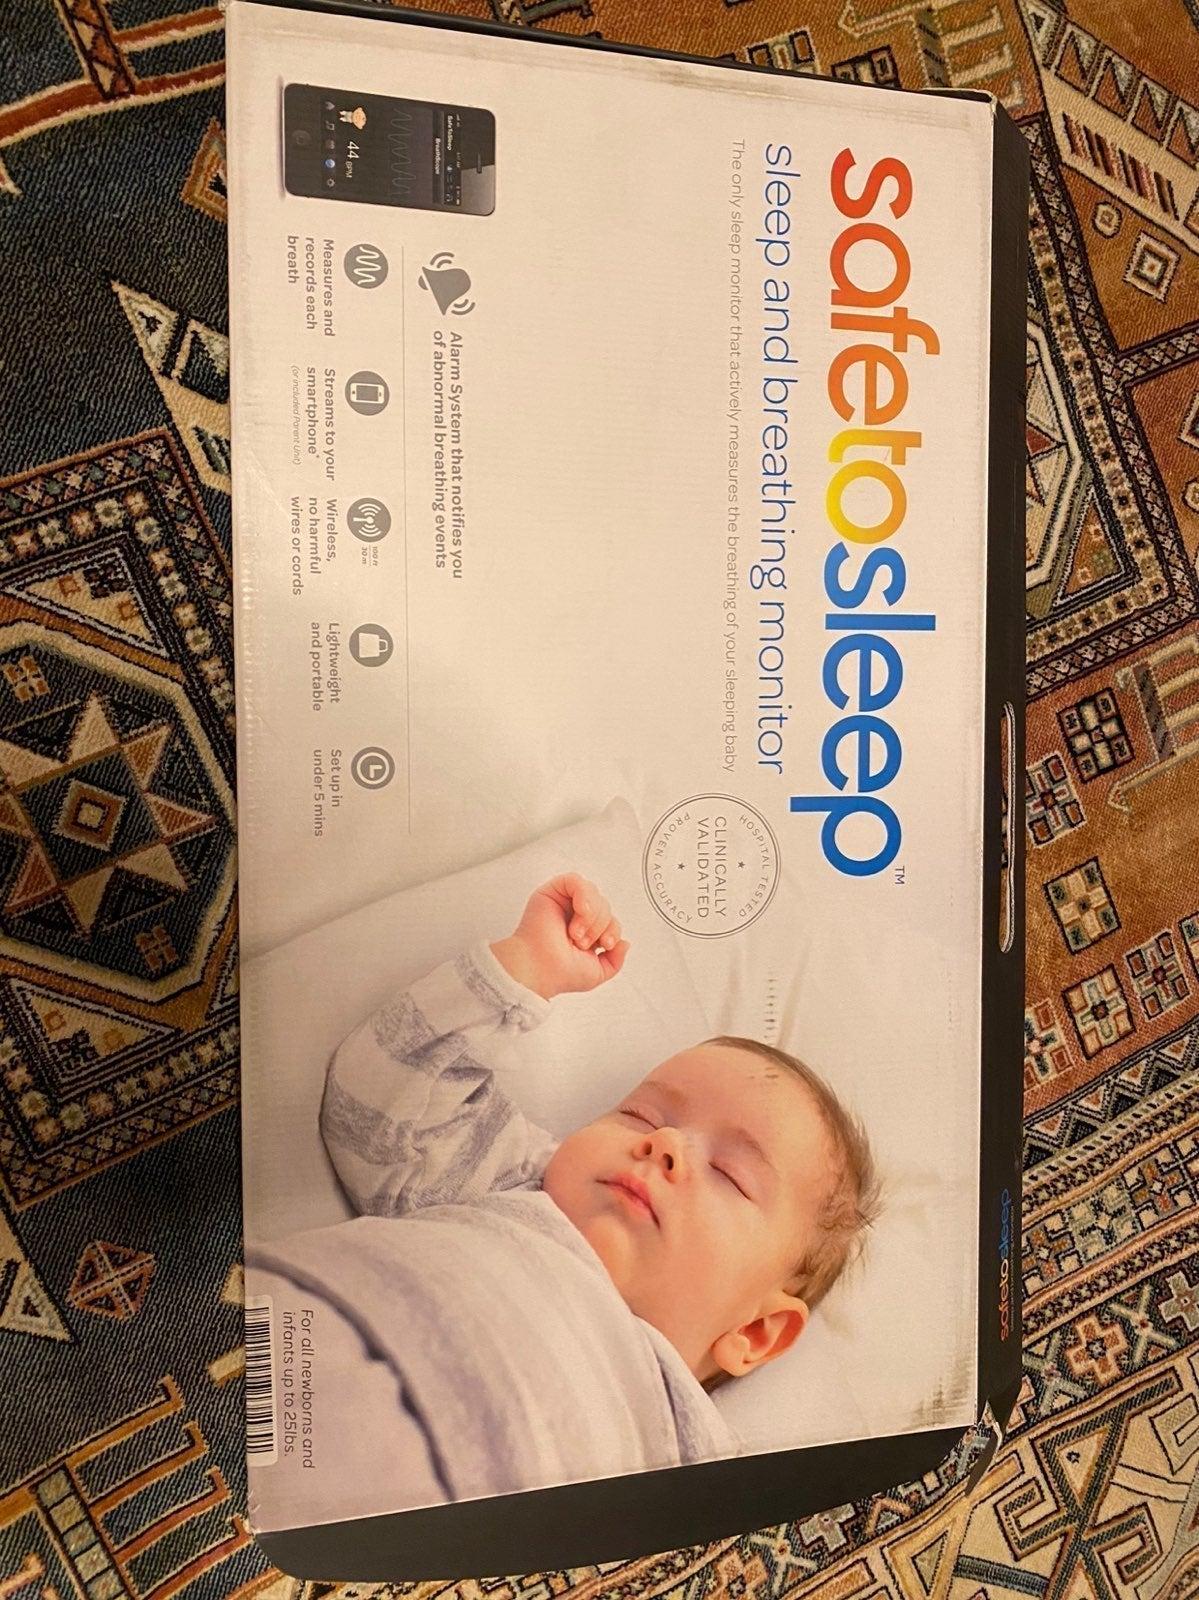 Safe to sleep baby monitor